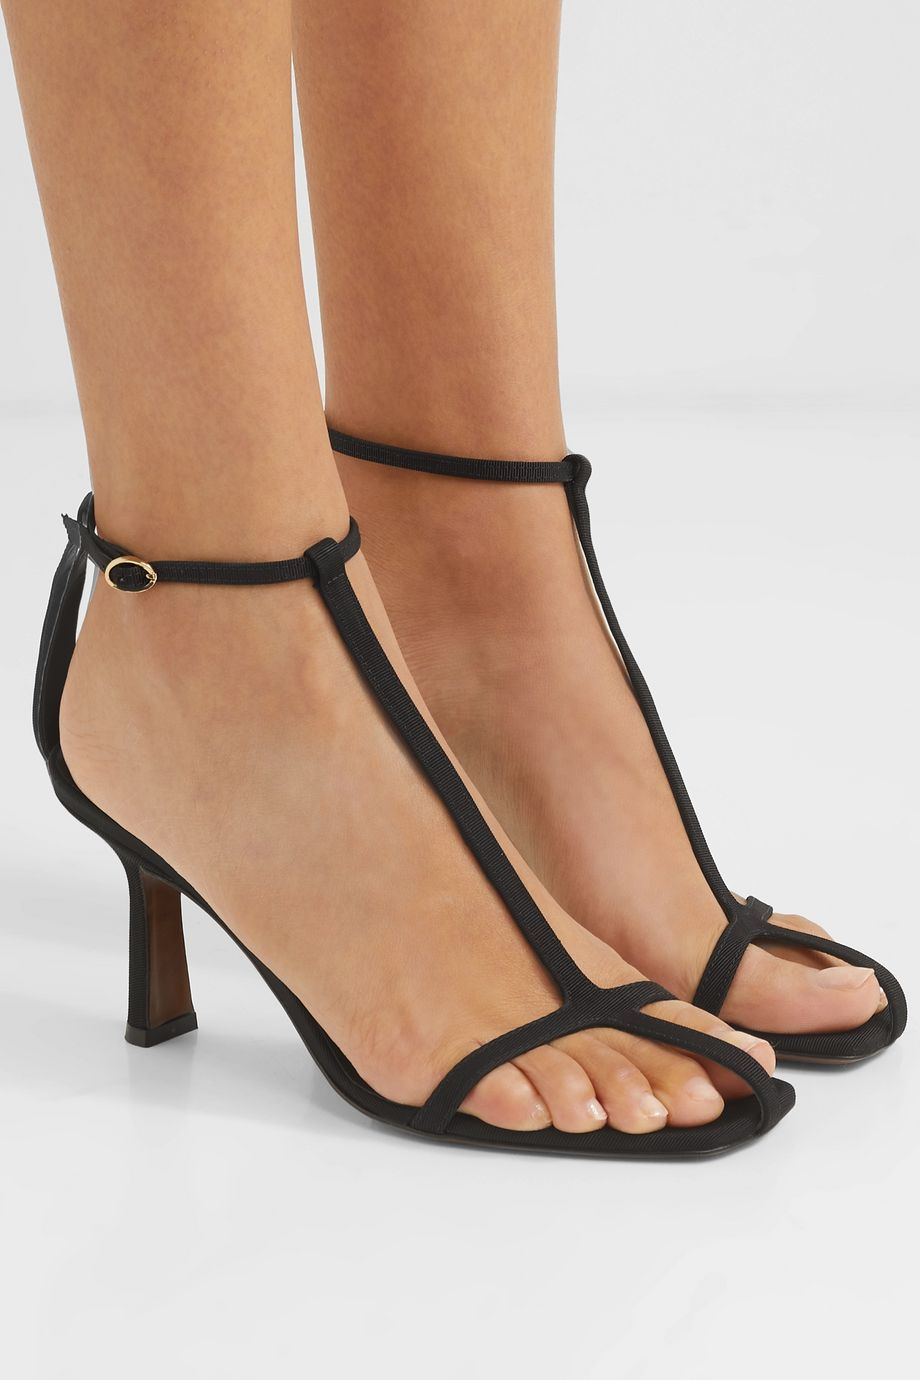 Neous Jumel grosgrain sandals